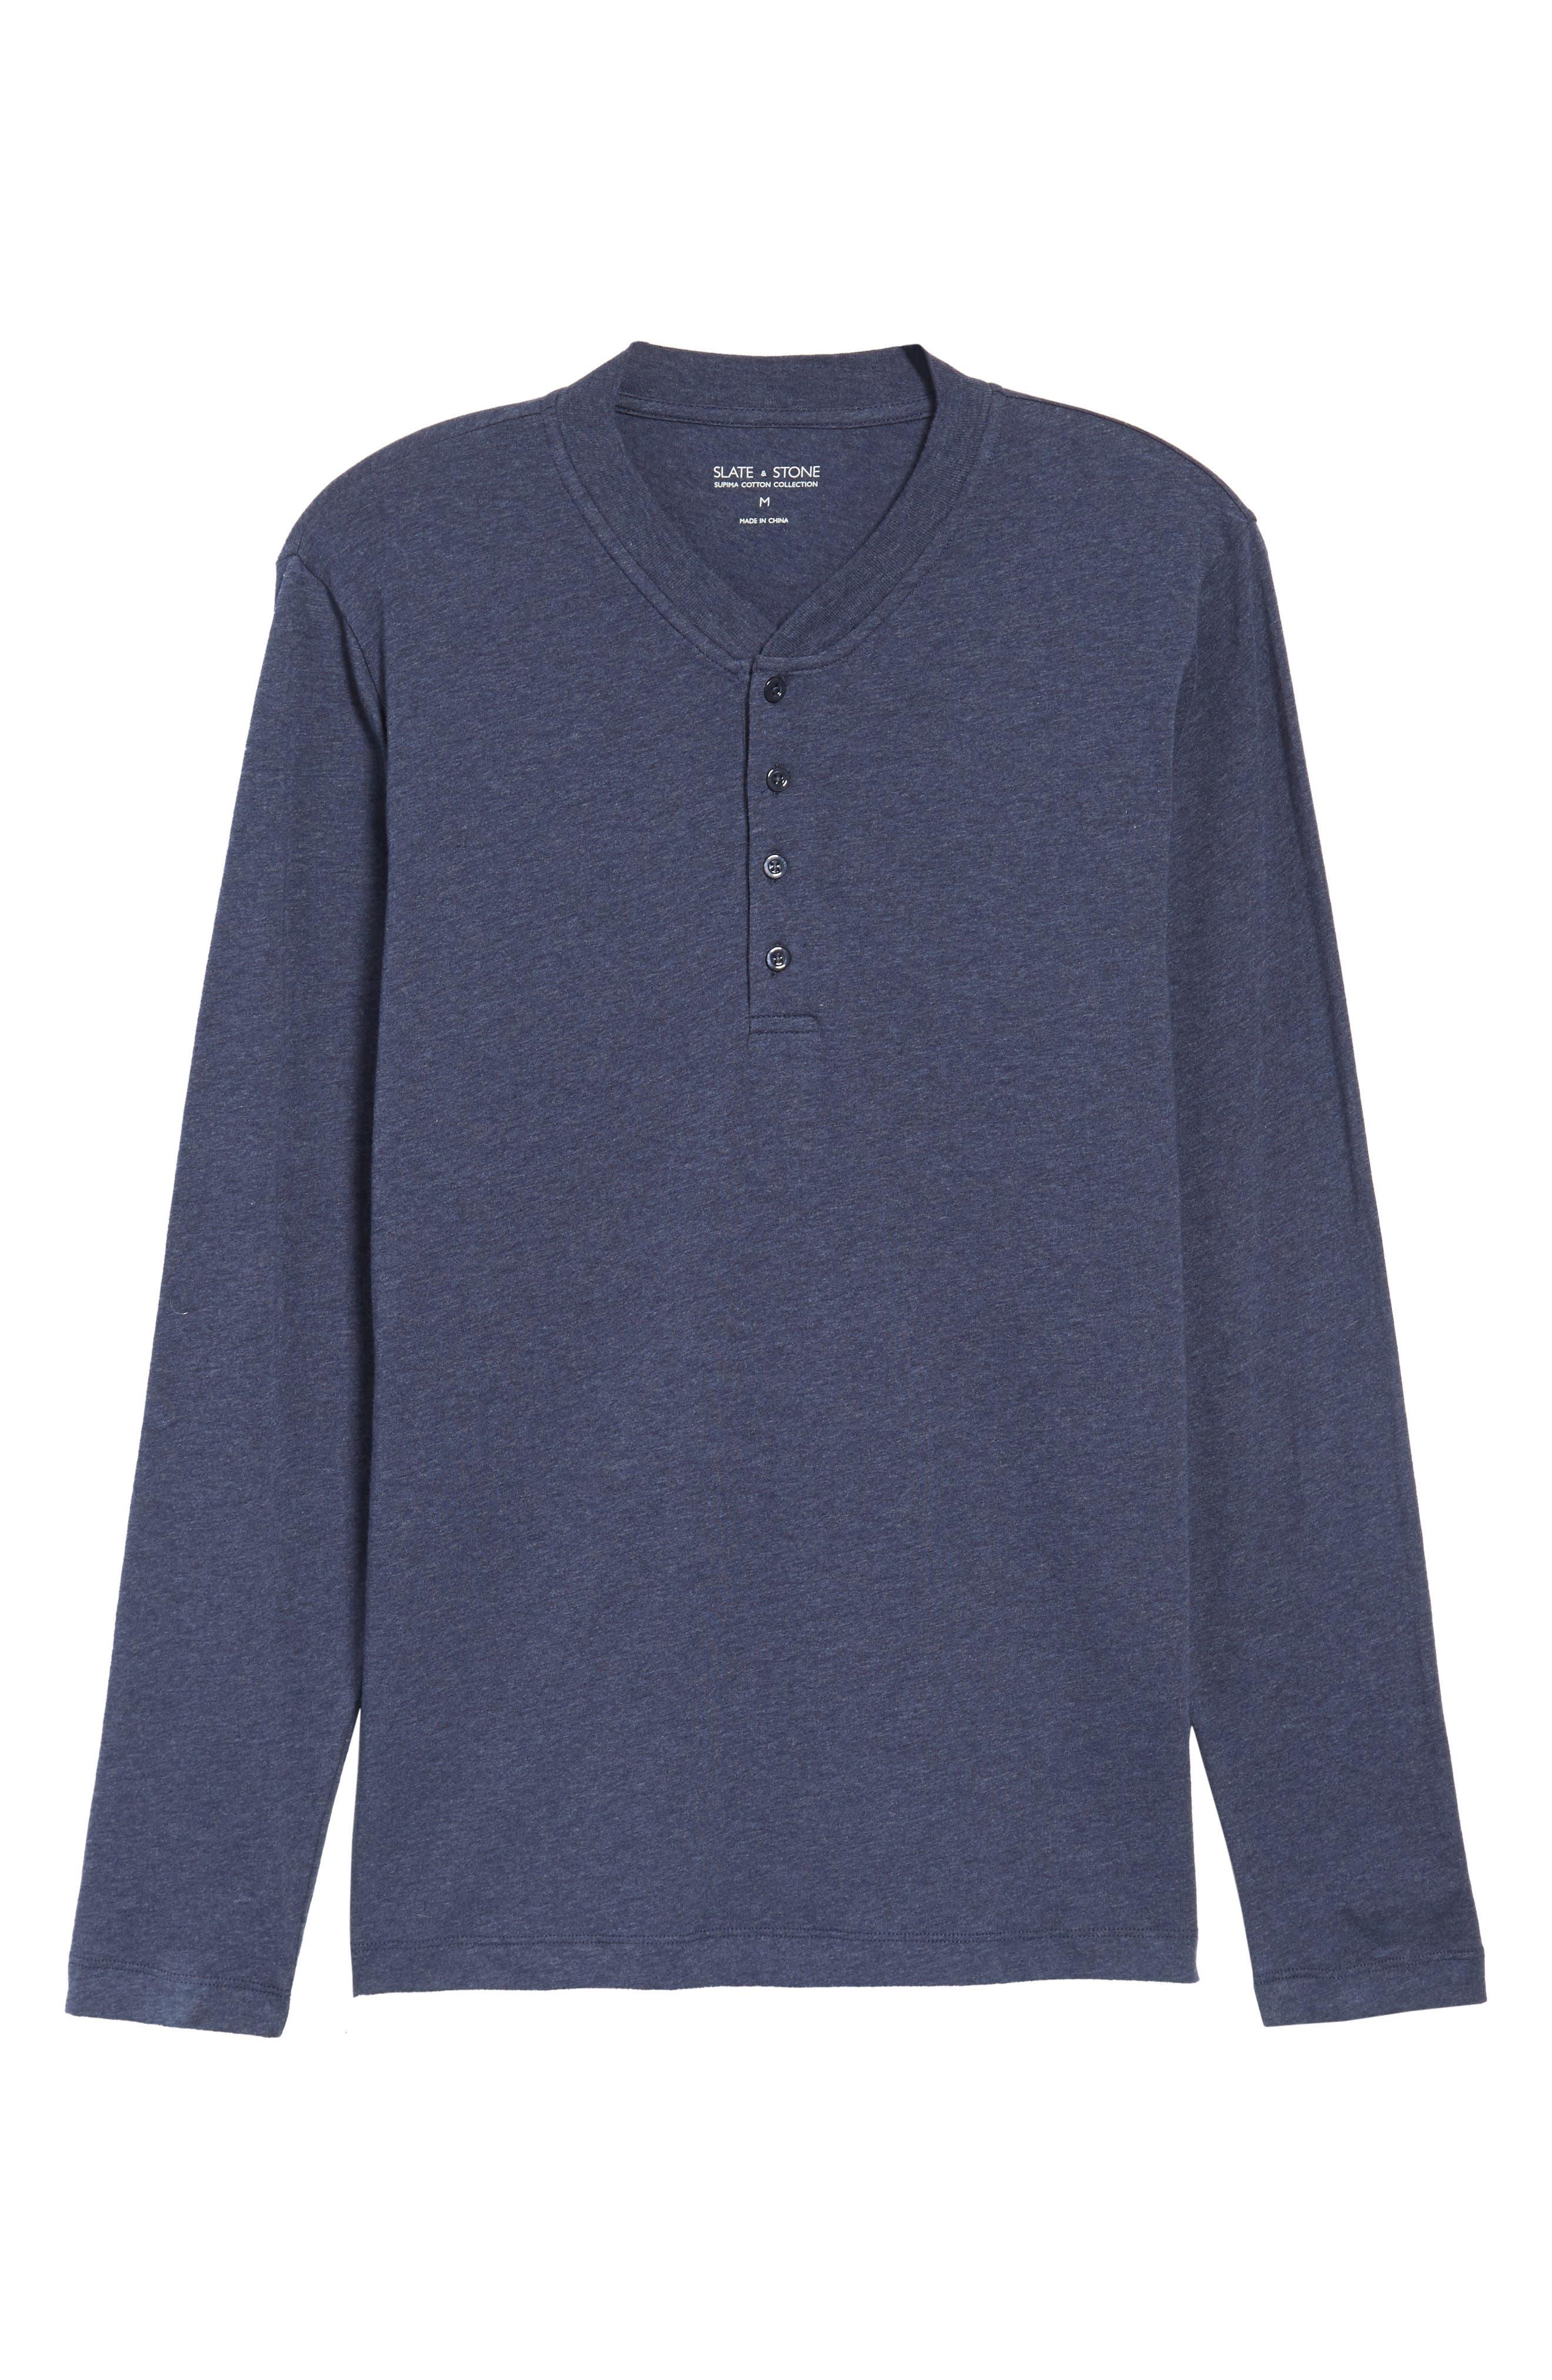 Long Sleeve Henley T-Shirt,                             Alternate thumbnail 6, color,                             Heather Blue